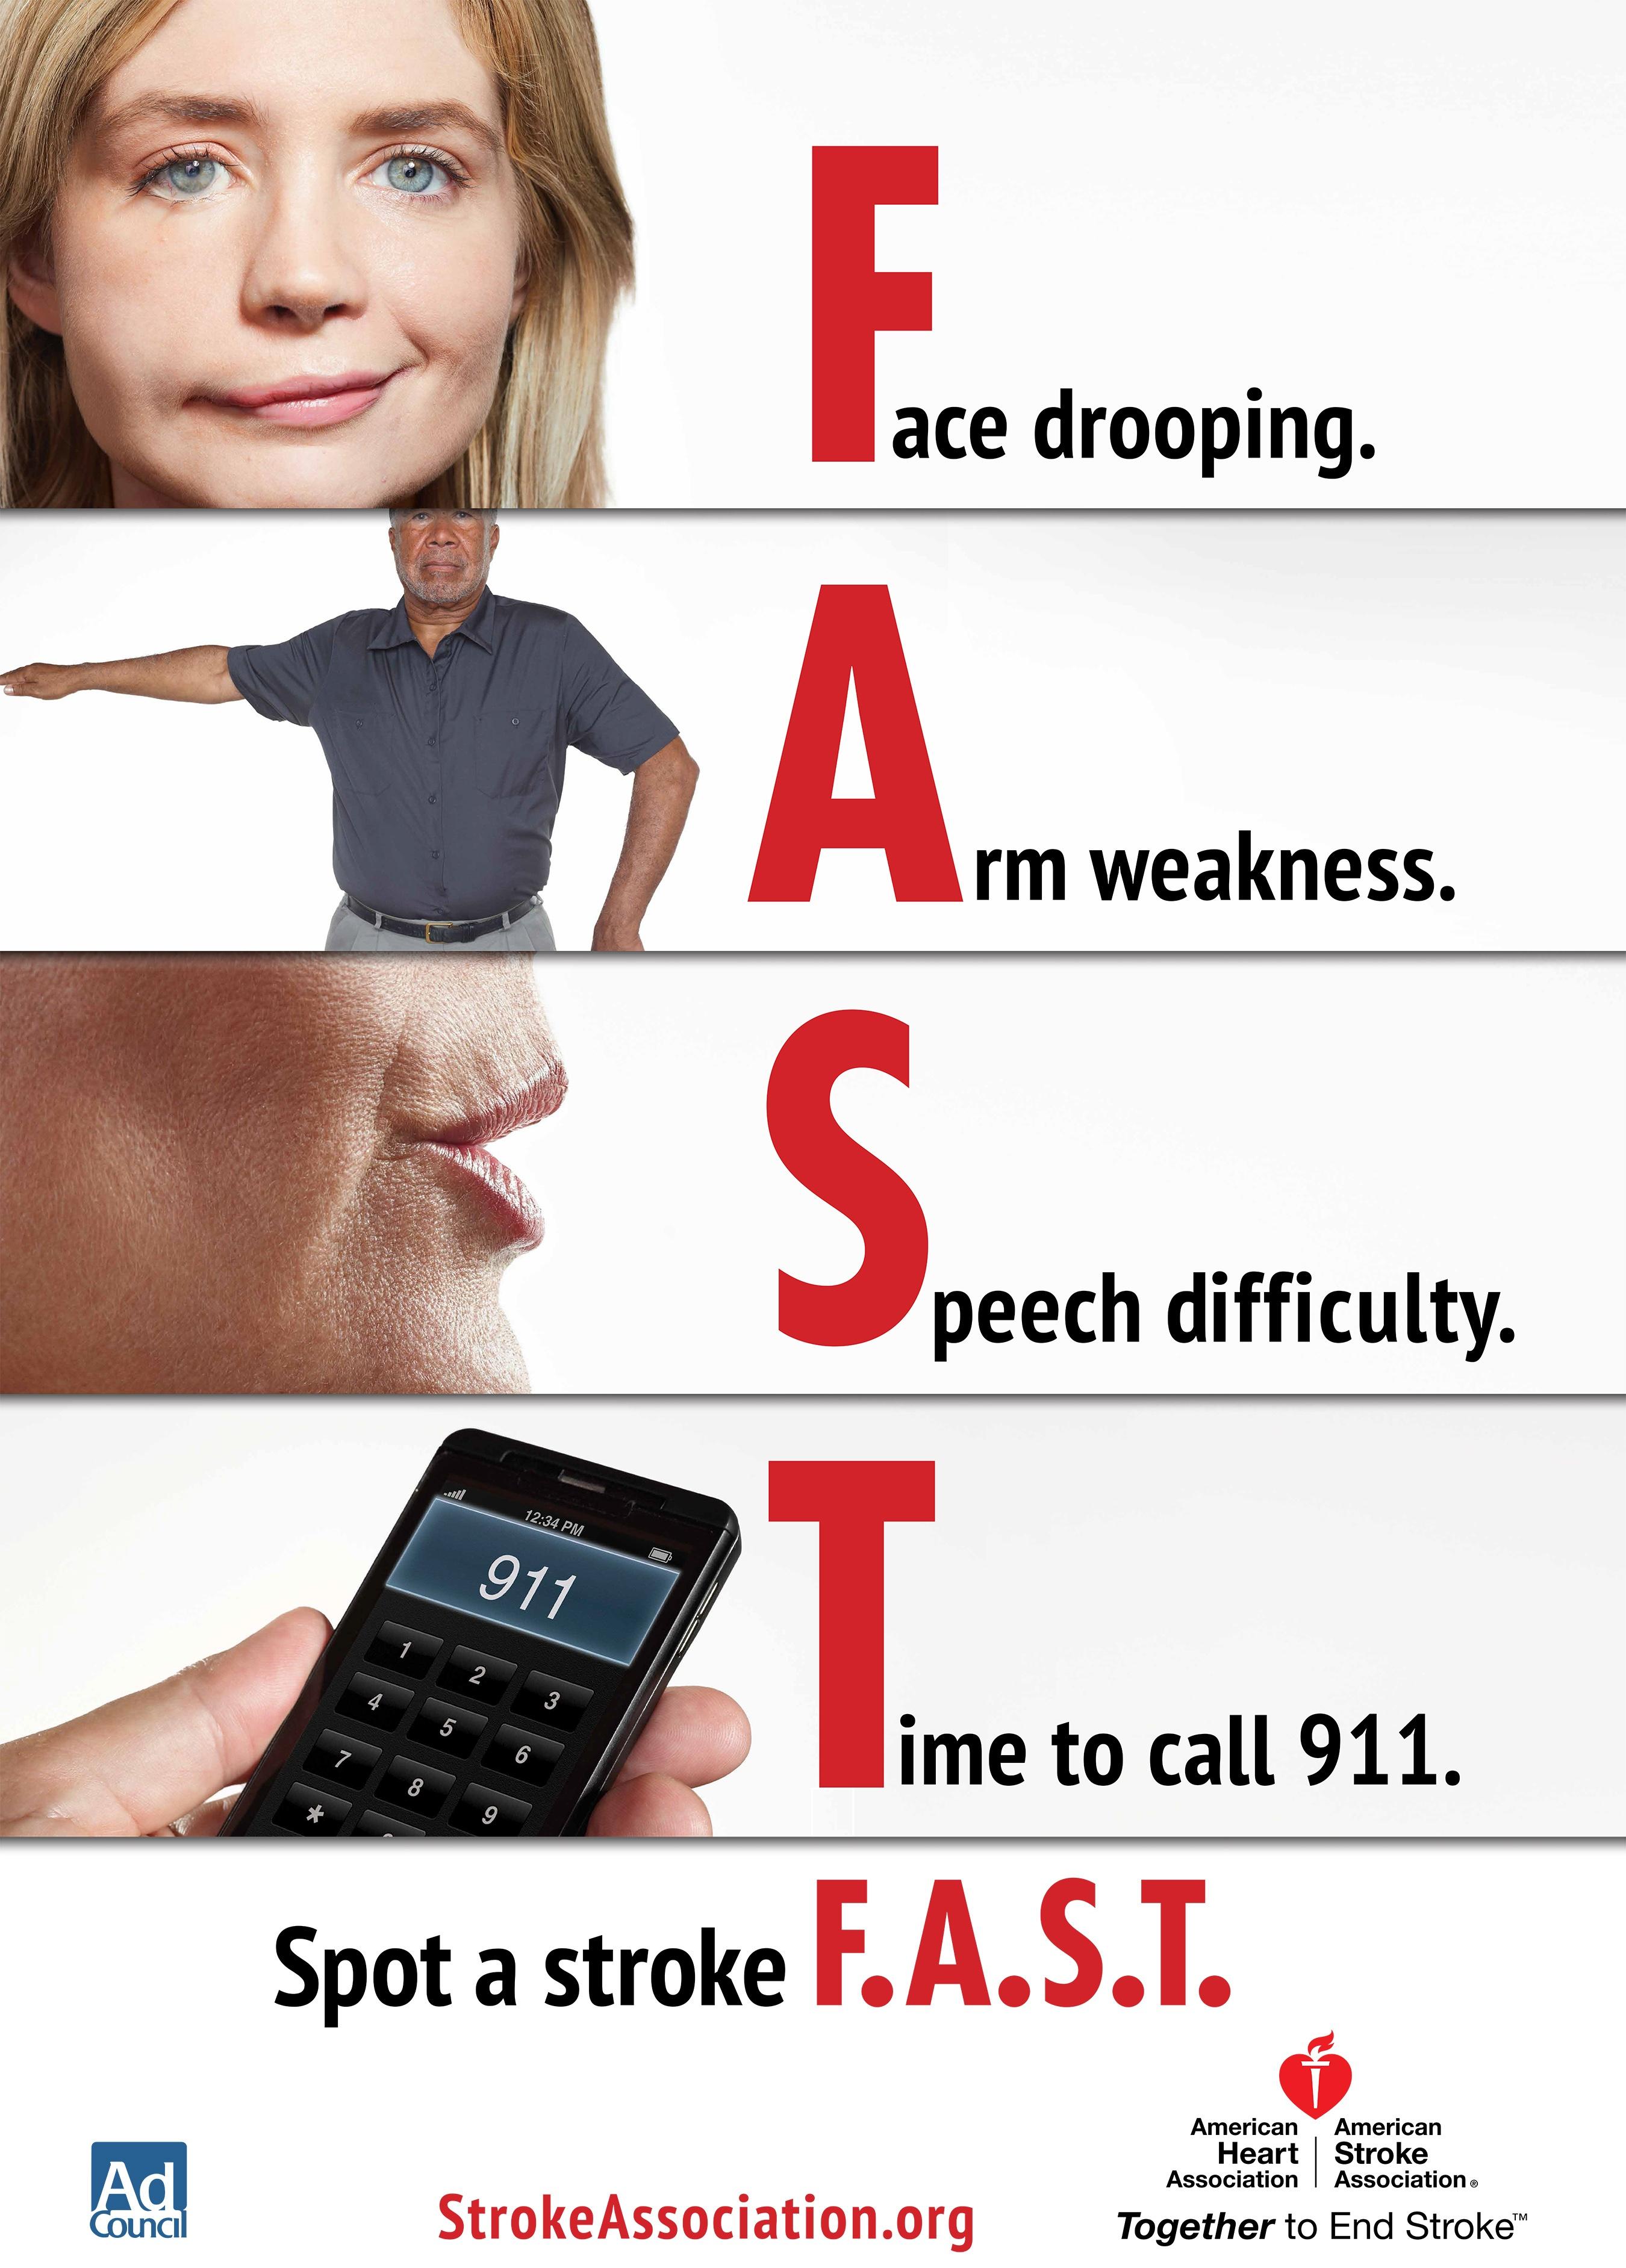 ACT-FAST-STROKE-ASSOCIATION